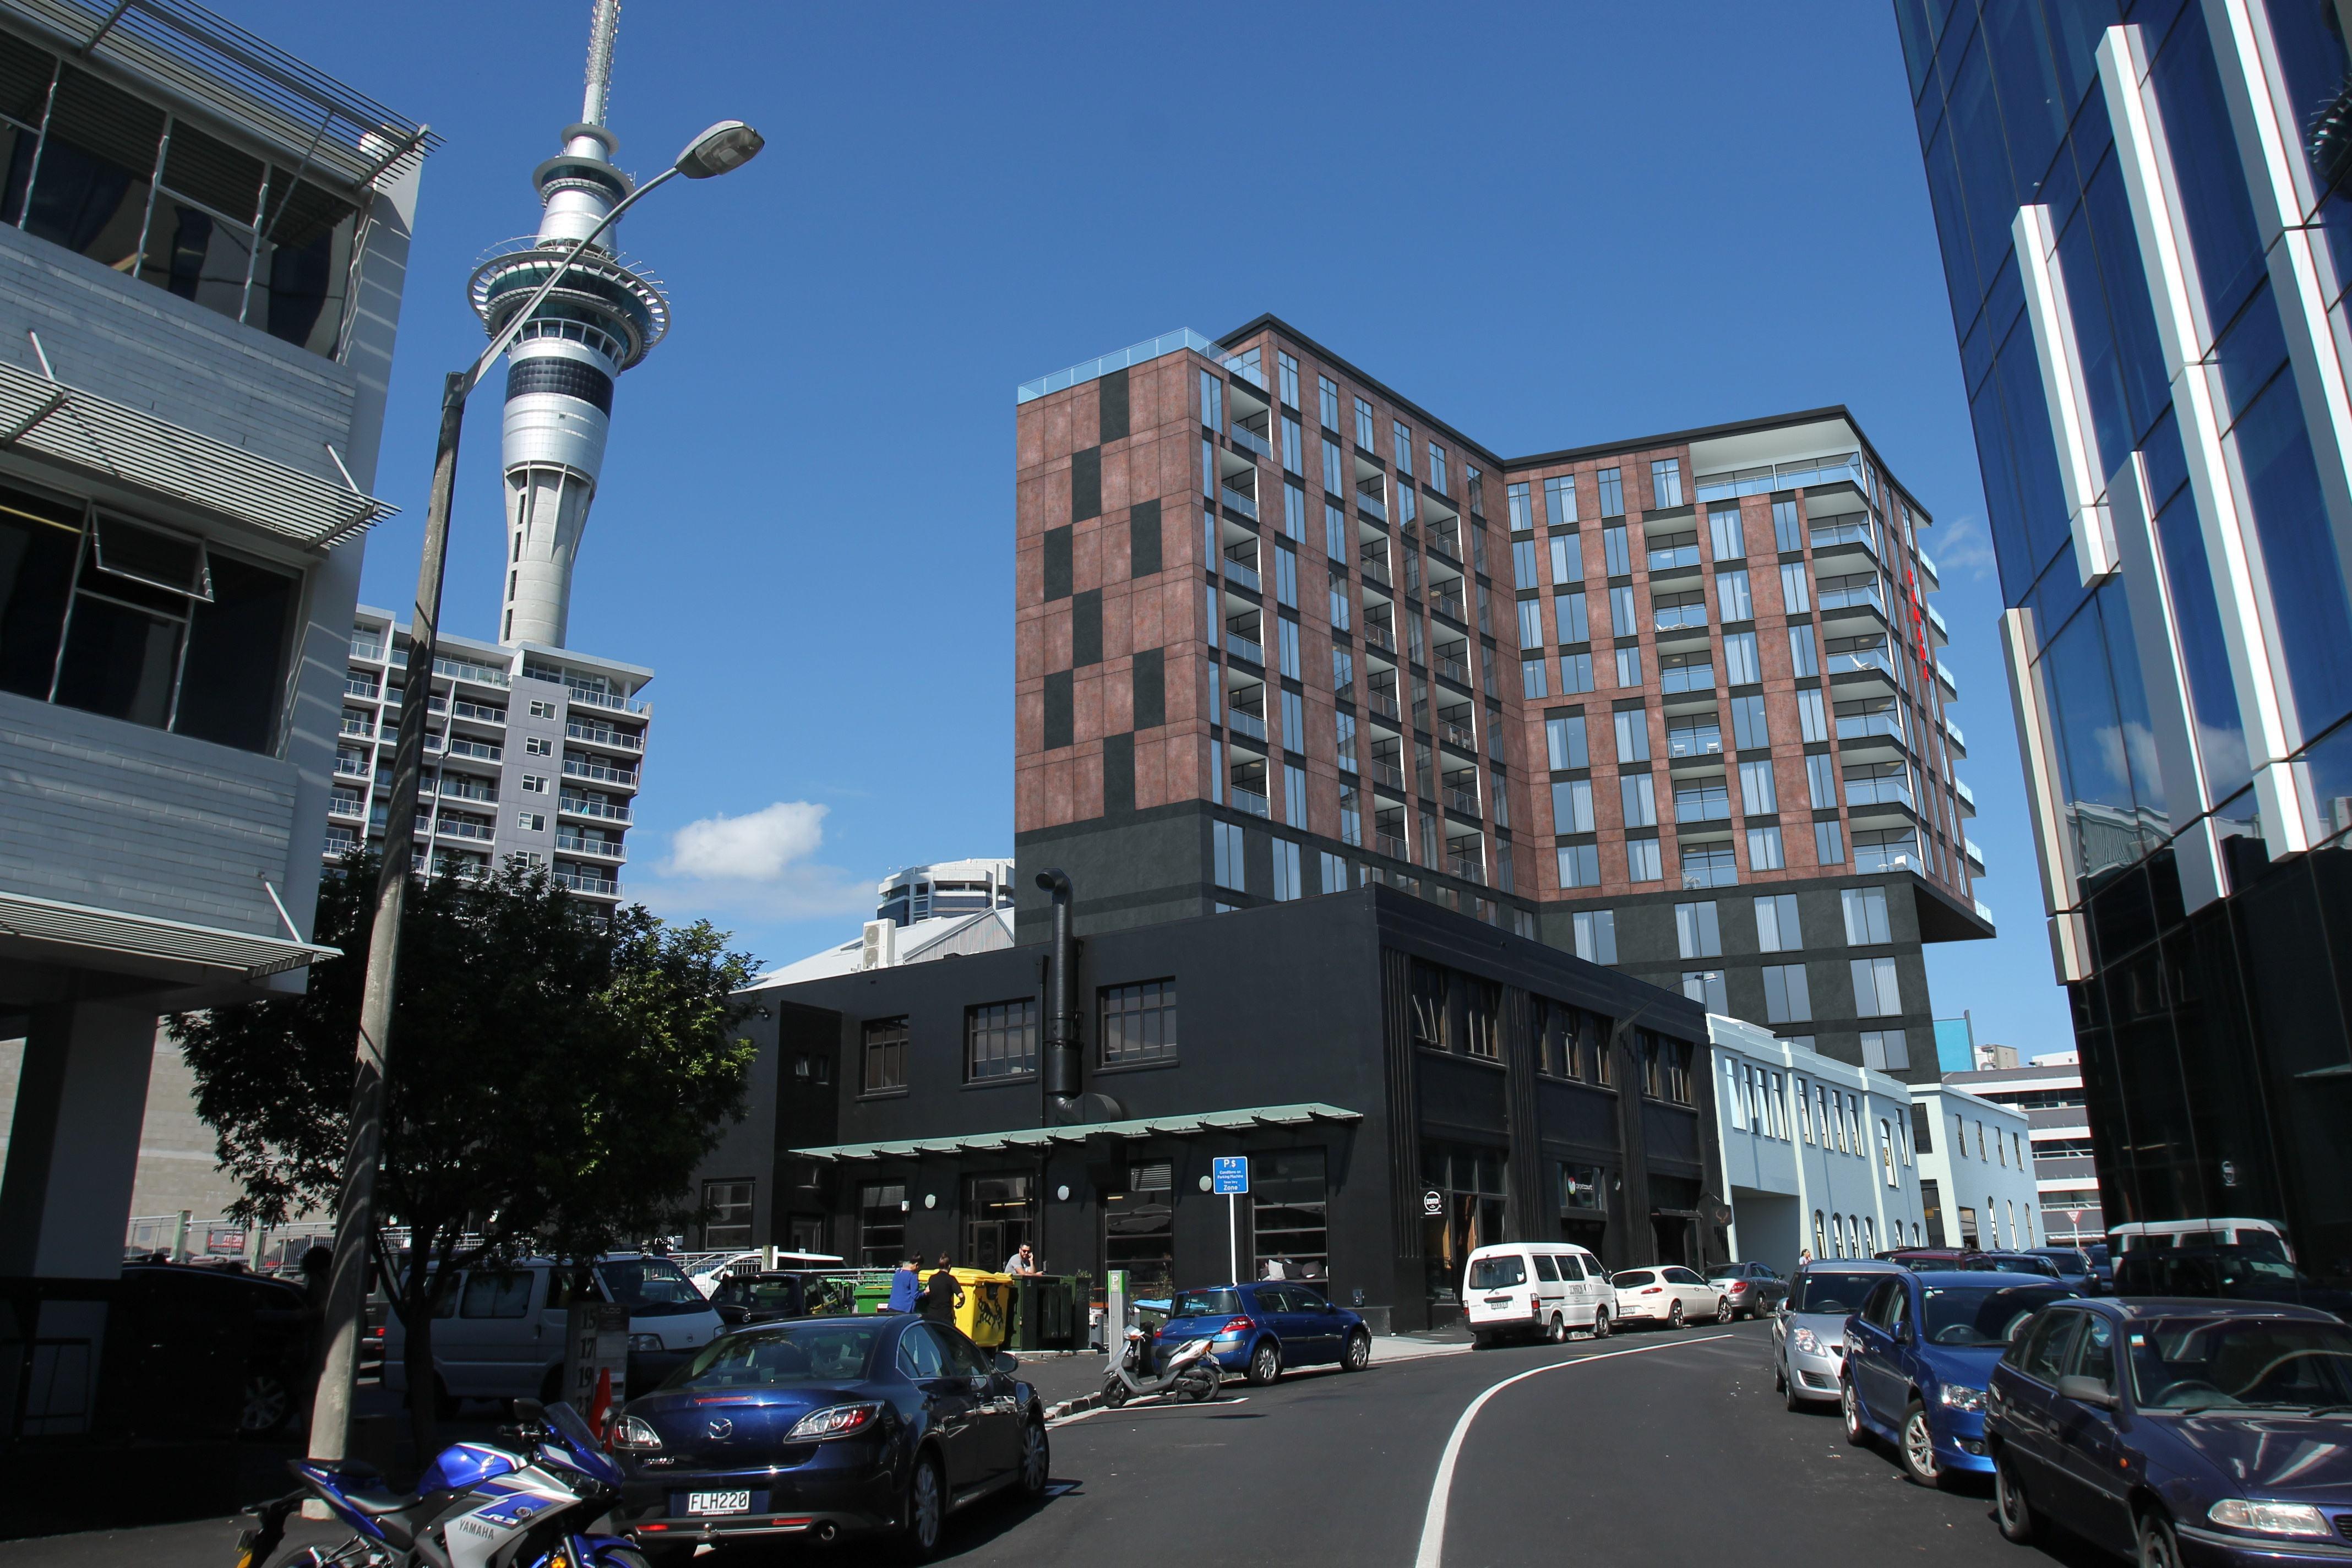 Auckland Central 奥克兰市中心维多利亚全新公寓,现房,拎包入住! 欢迎海外买家购买并自住!